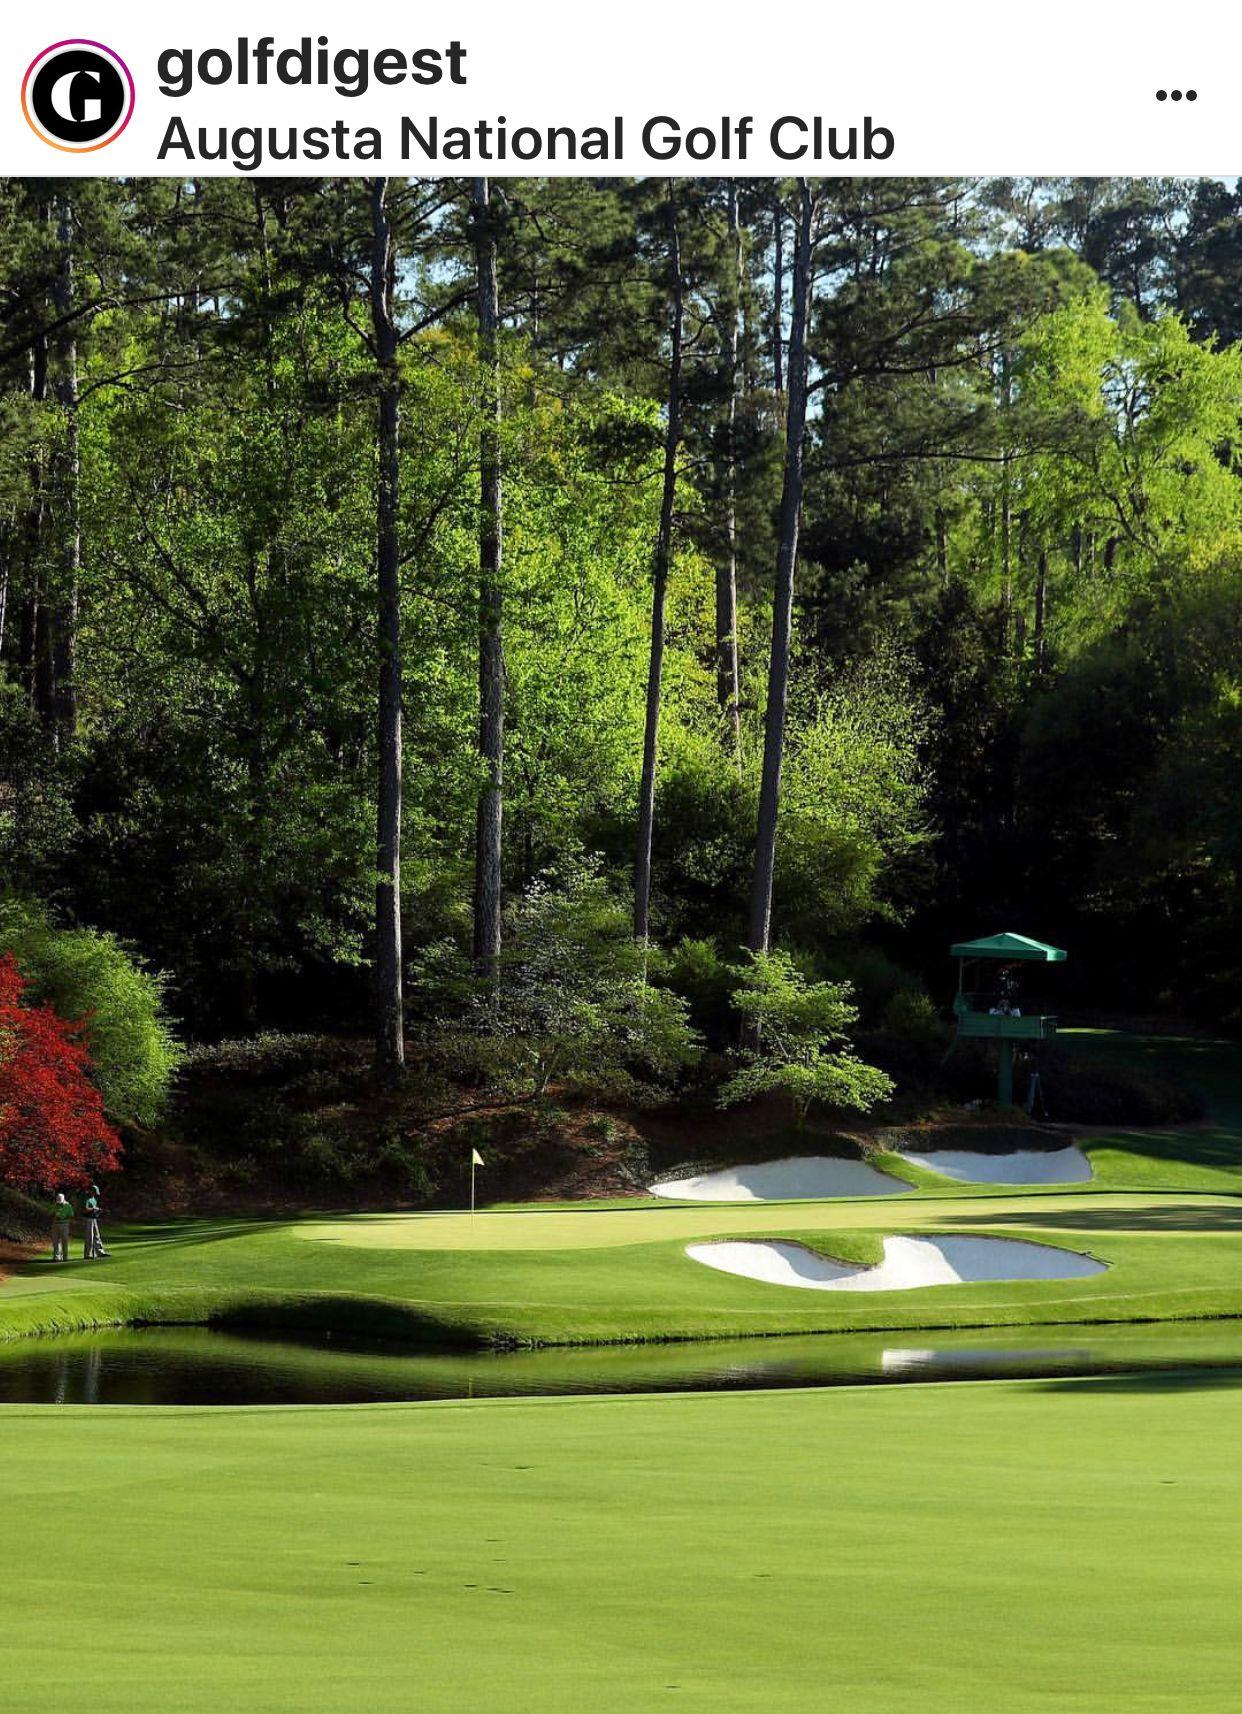 Pin Oleh Beter Gras Di Golf Destinations Taman